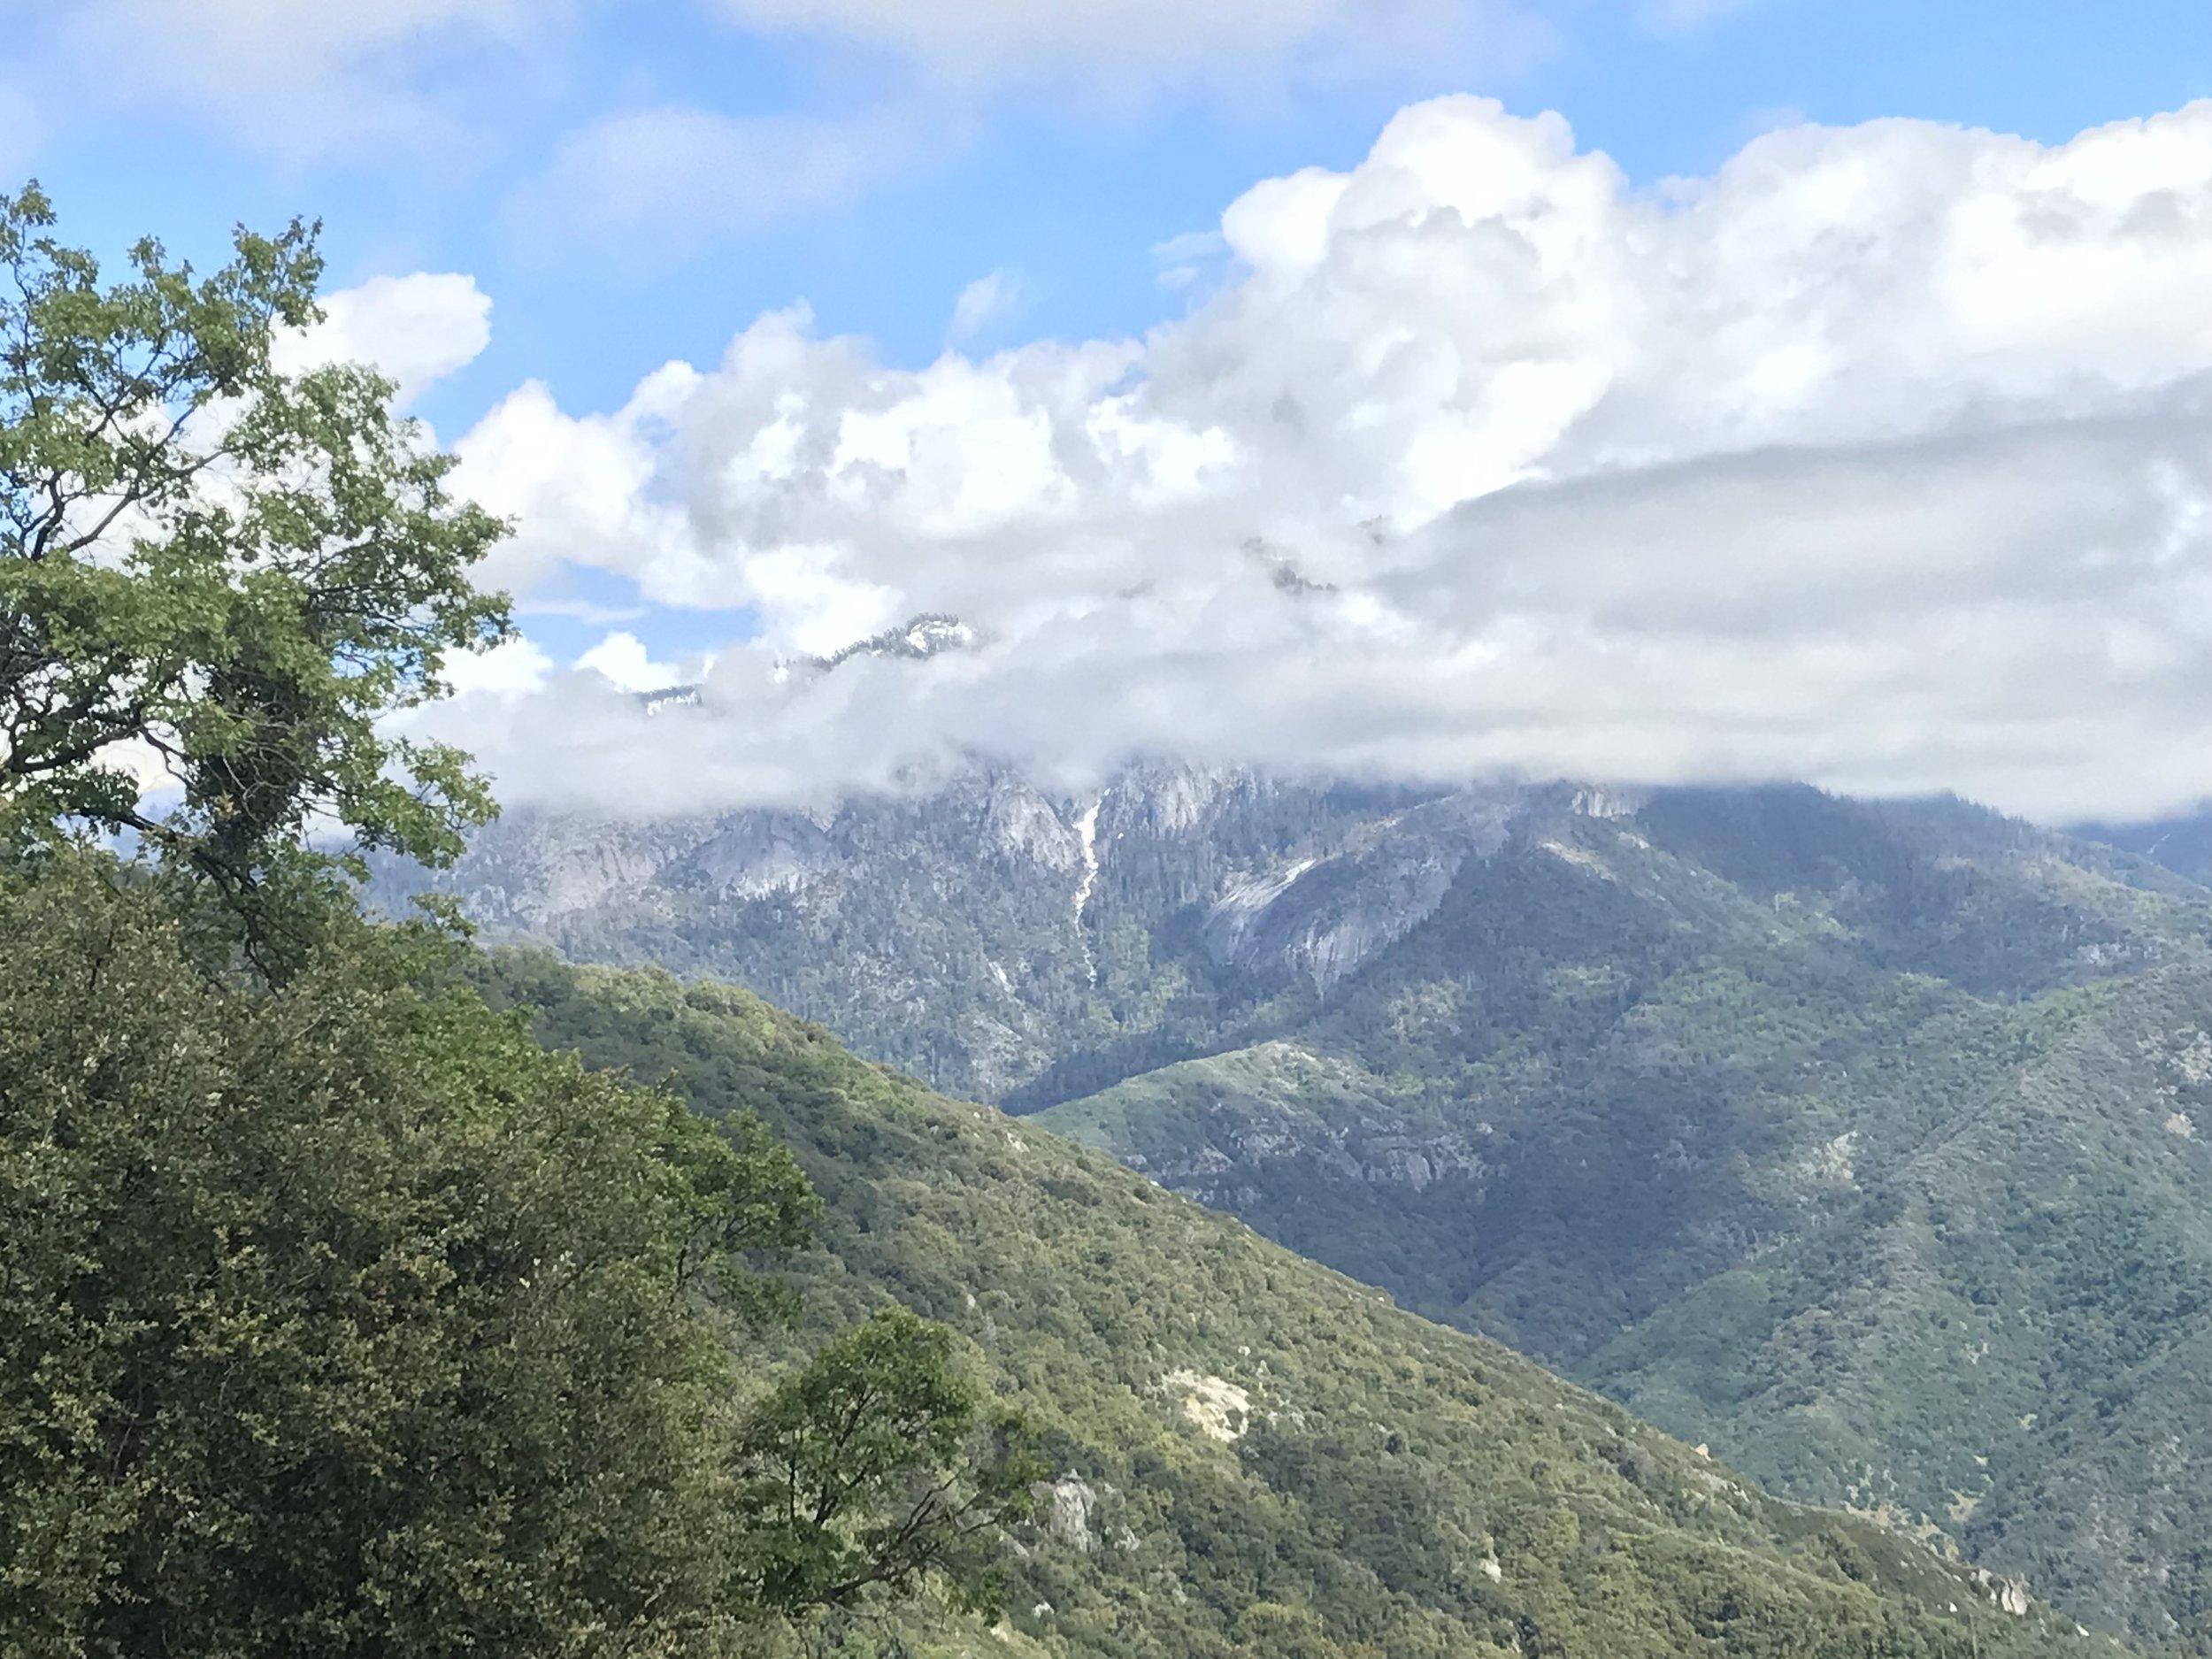 Mountains near Sequoia National Park